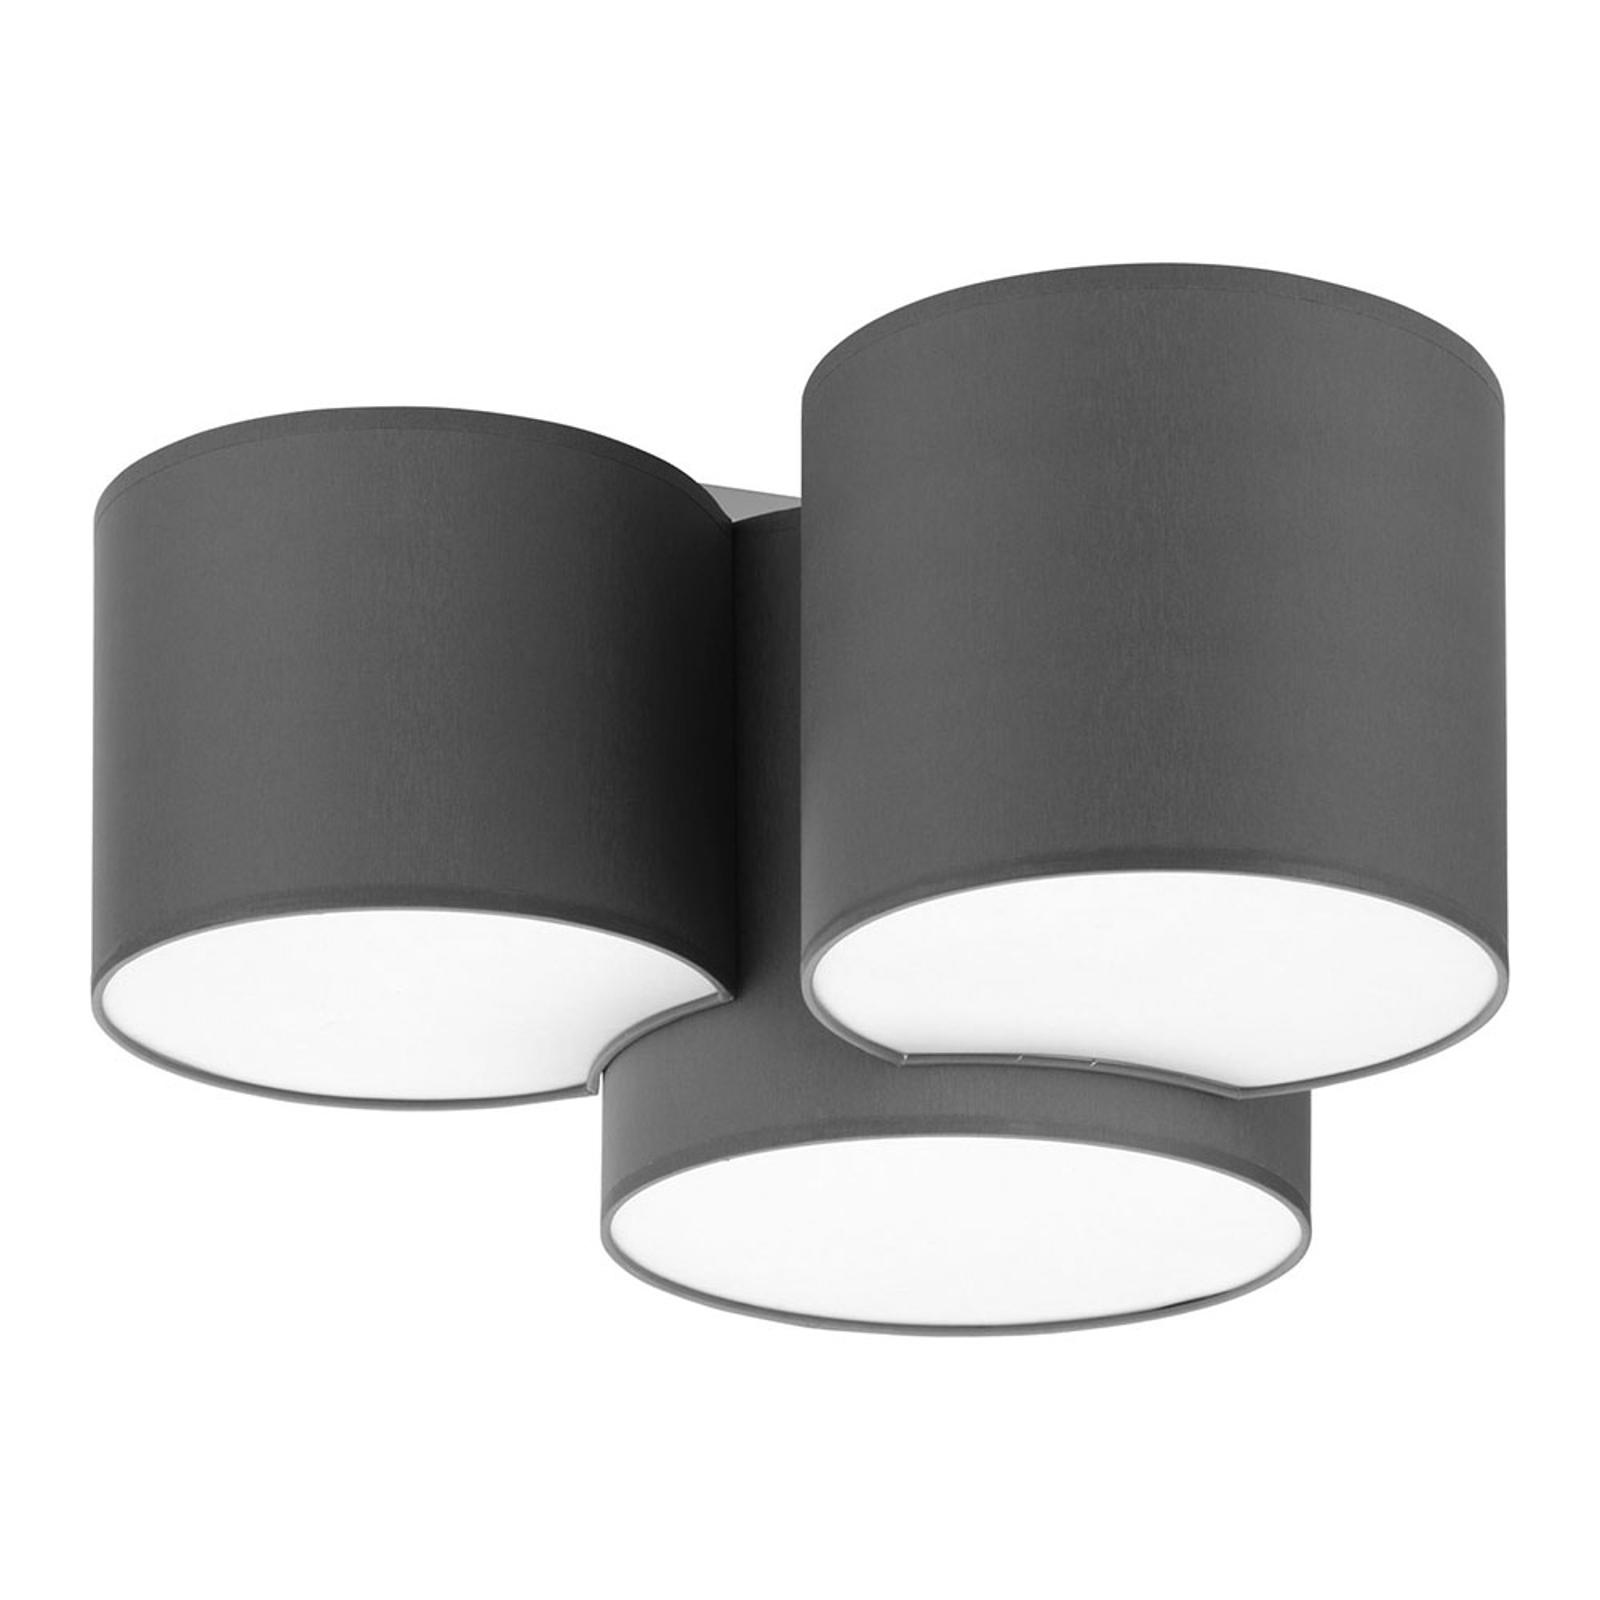 Taklampe Mona, 3 lyskilder, grå